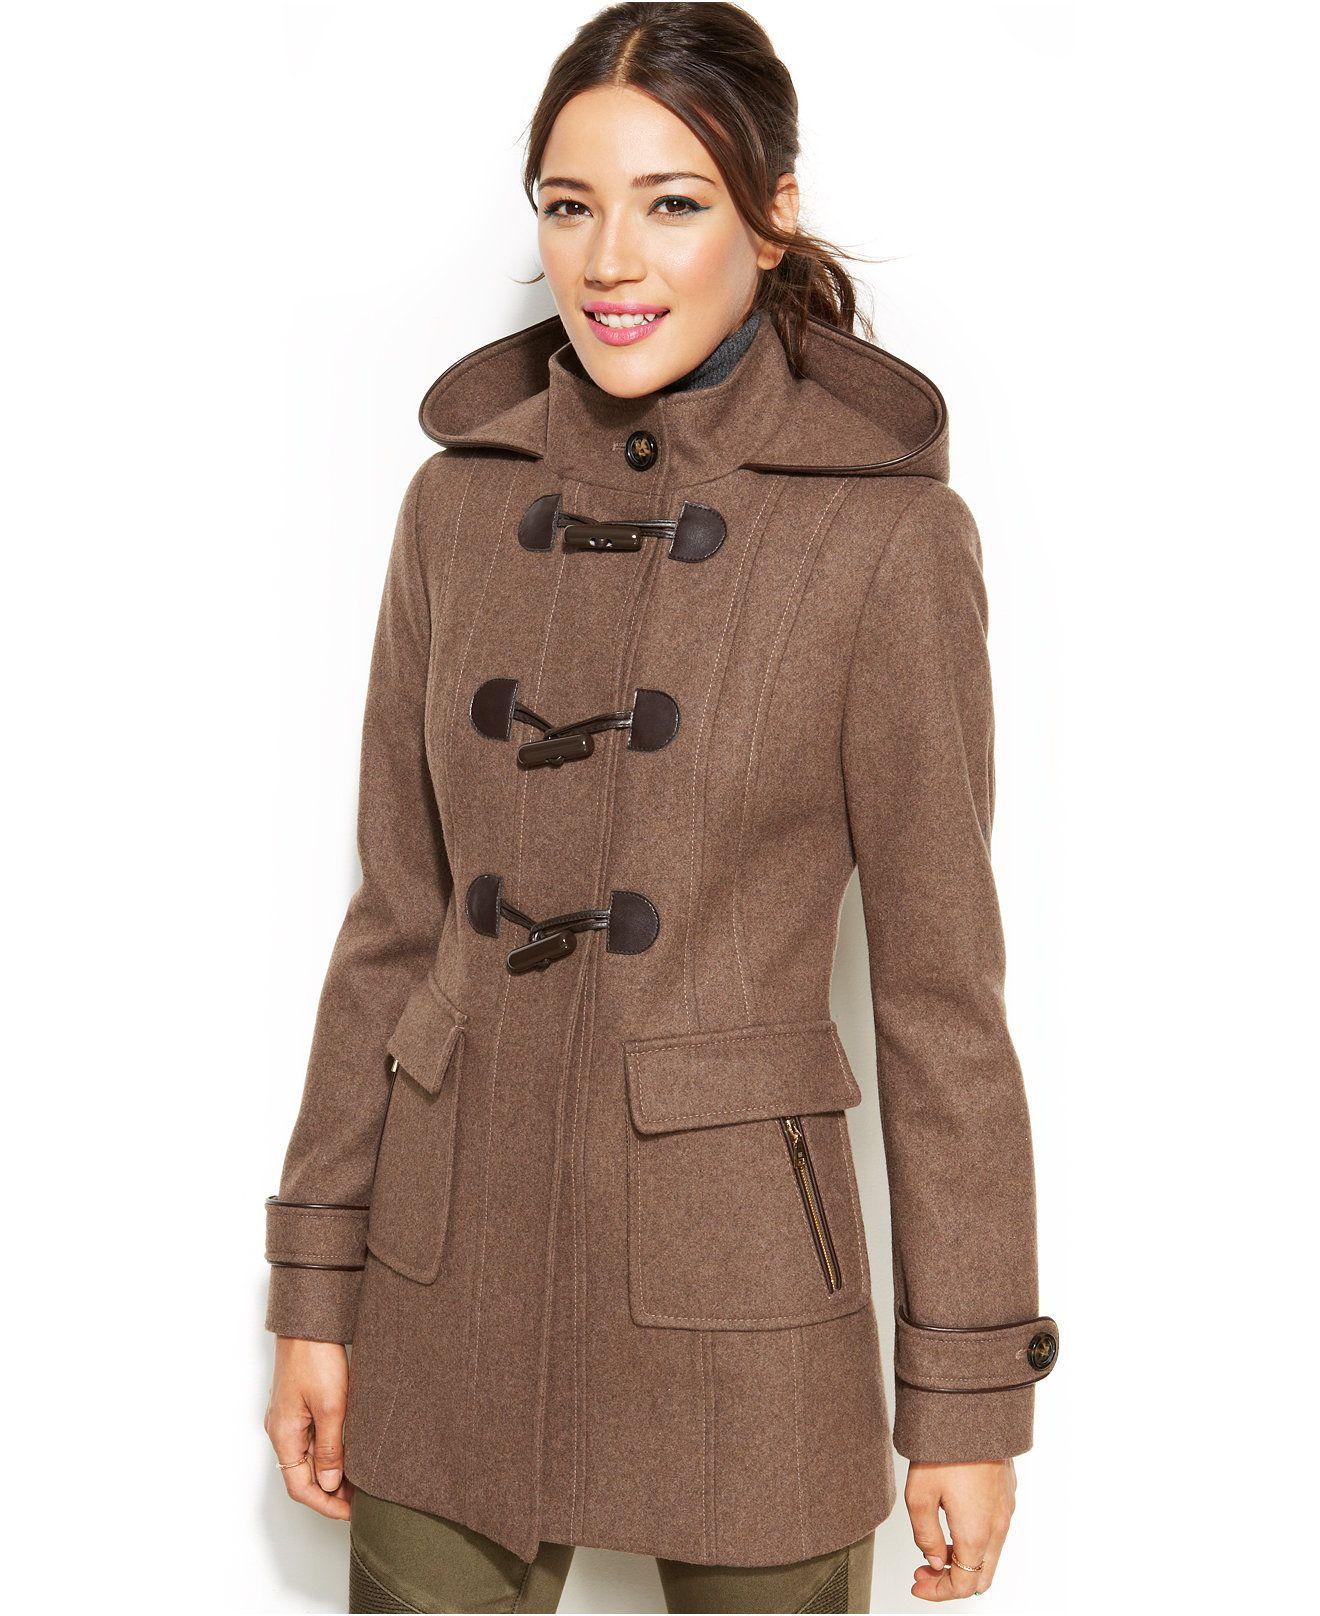 Laundry By Design Faux Leather Trim Hooded Toggle Front Coat Coats Women Macy S Coat Coats For Women Coats Jackets Women